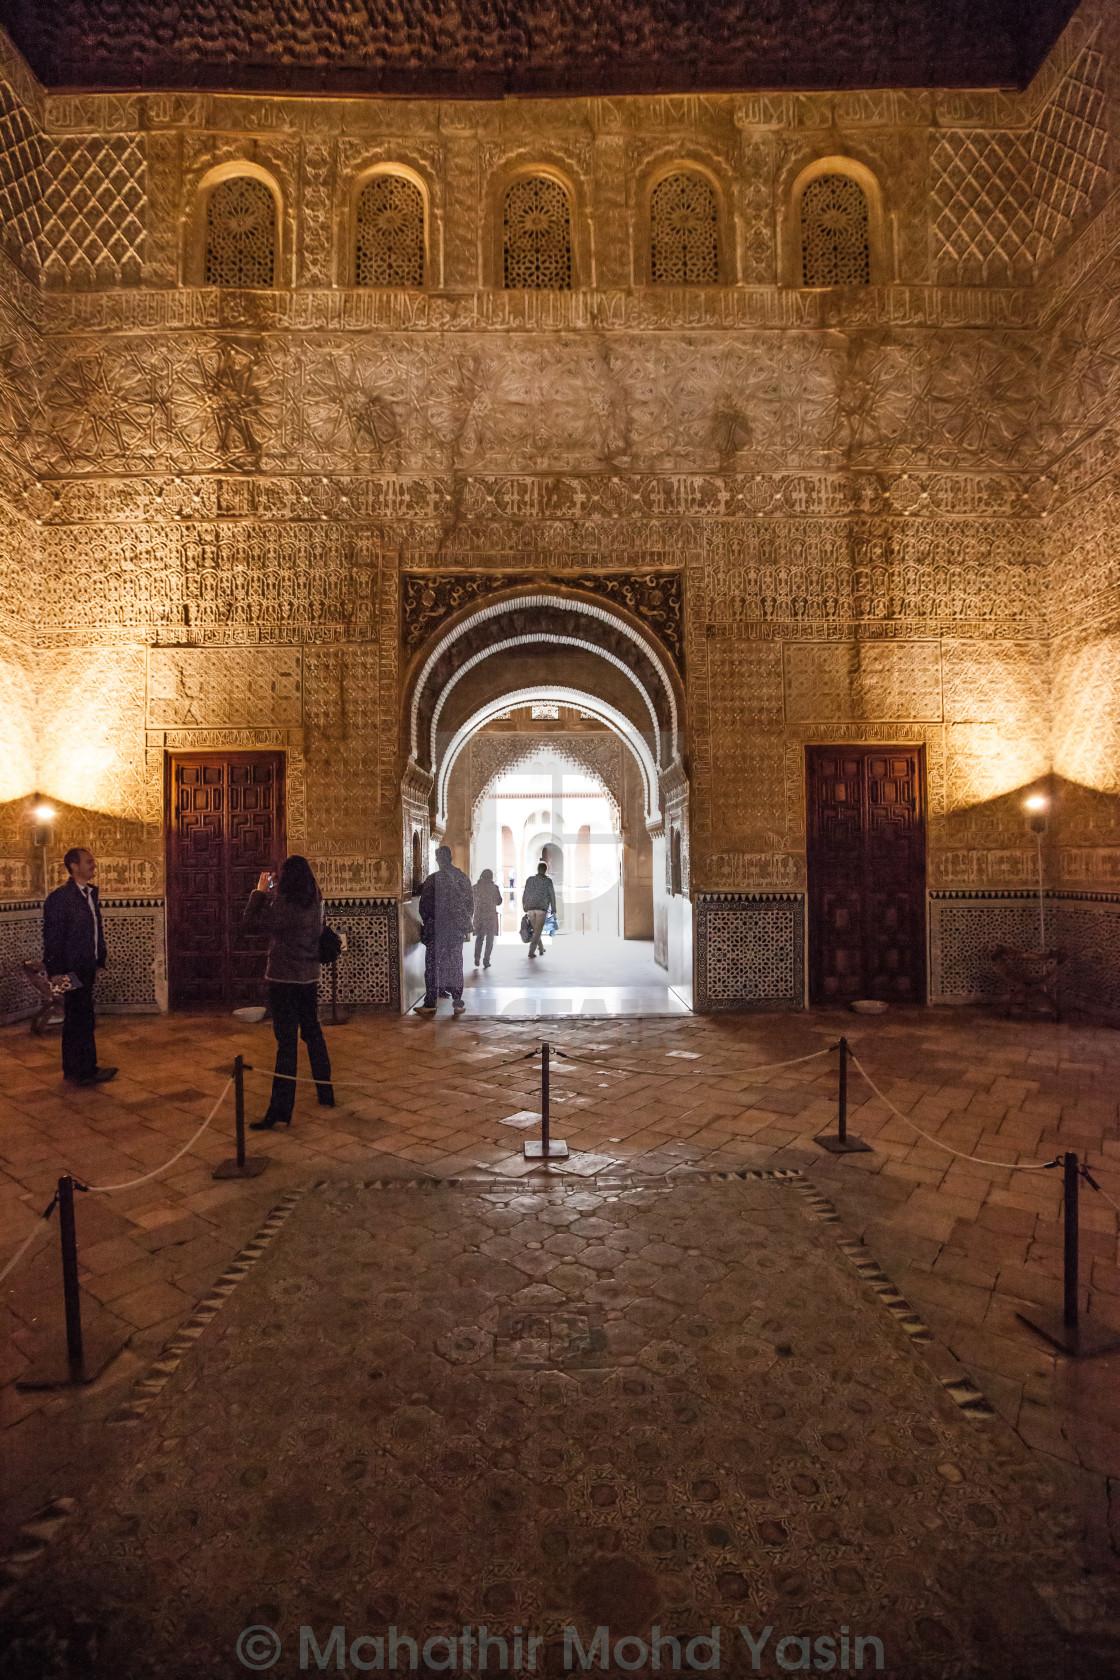 Alhambra Palace, Granada, Spain - License, download or print